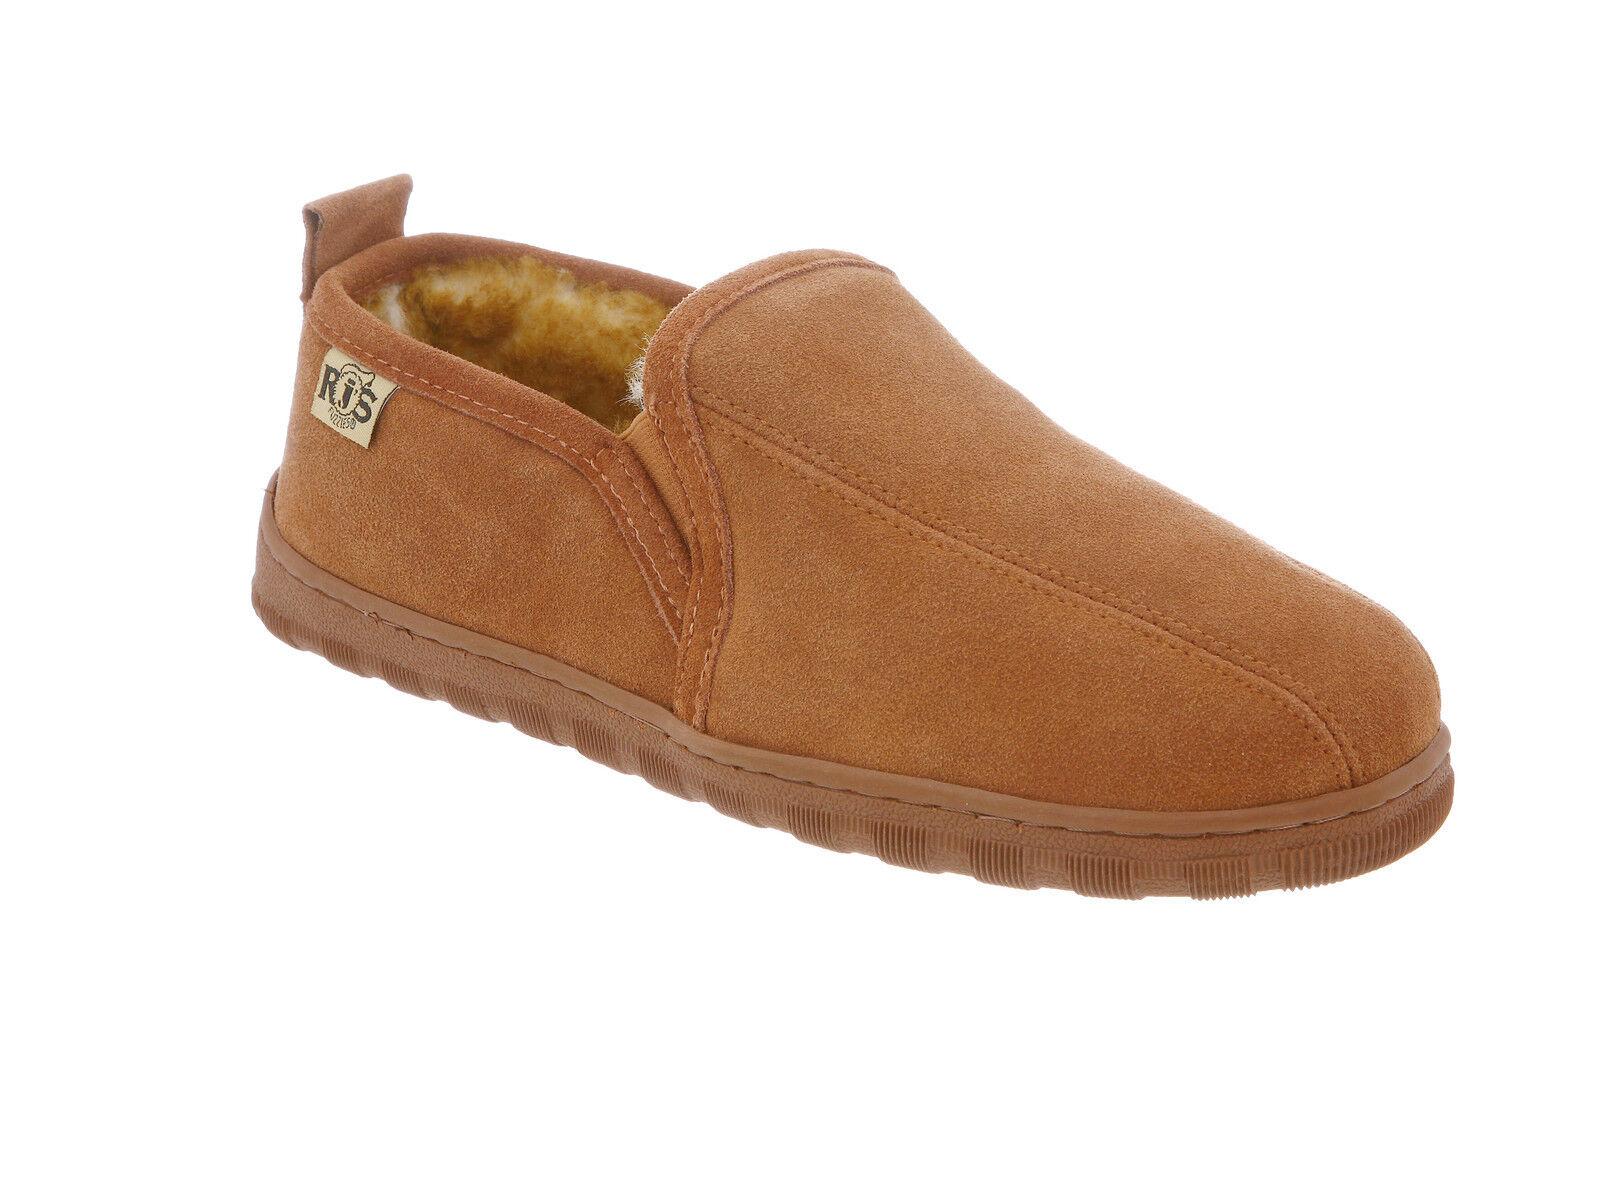 Rj De Fuzzies Piel De Oveja Para Hombre Romeo Slipper Zapato Castaño Medio (D, M) Talla 11m